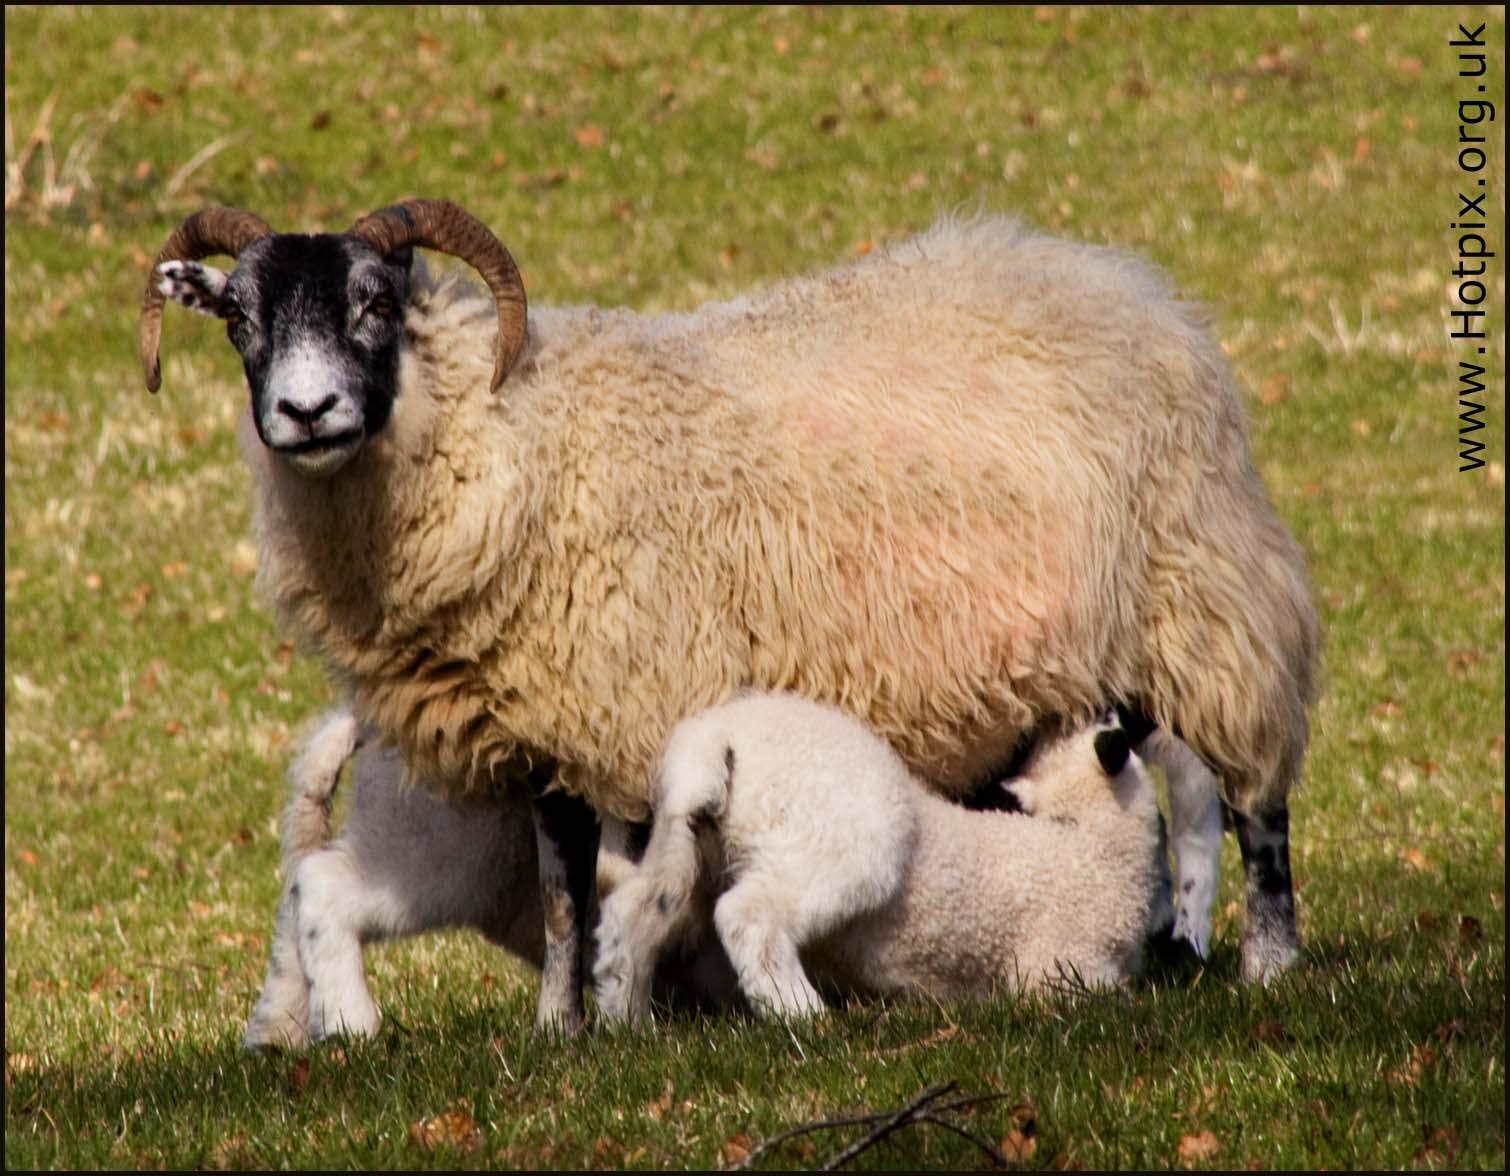 lamb,mutton,sheep,hill,farm,spring,field,green,grass,countryside lamb,countryside,lamington,lanarkshire,scotland,uk,gb,britain,hotpics,hotpix,tonysmith,feeding,milk,weening,365project,nature,natural,history,sex,sexy,edinbrugh,rural